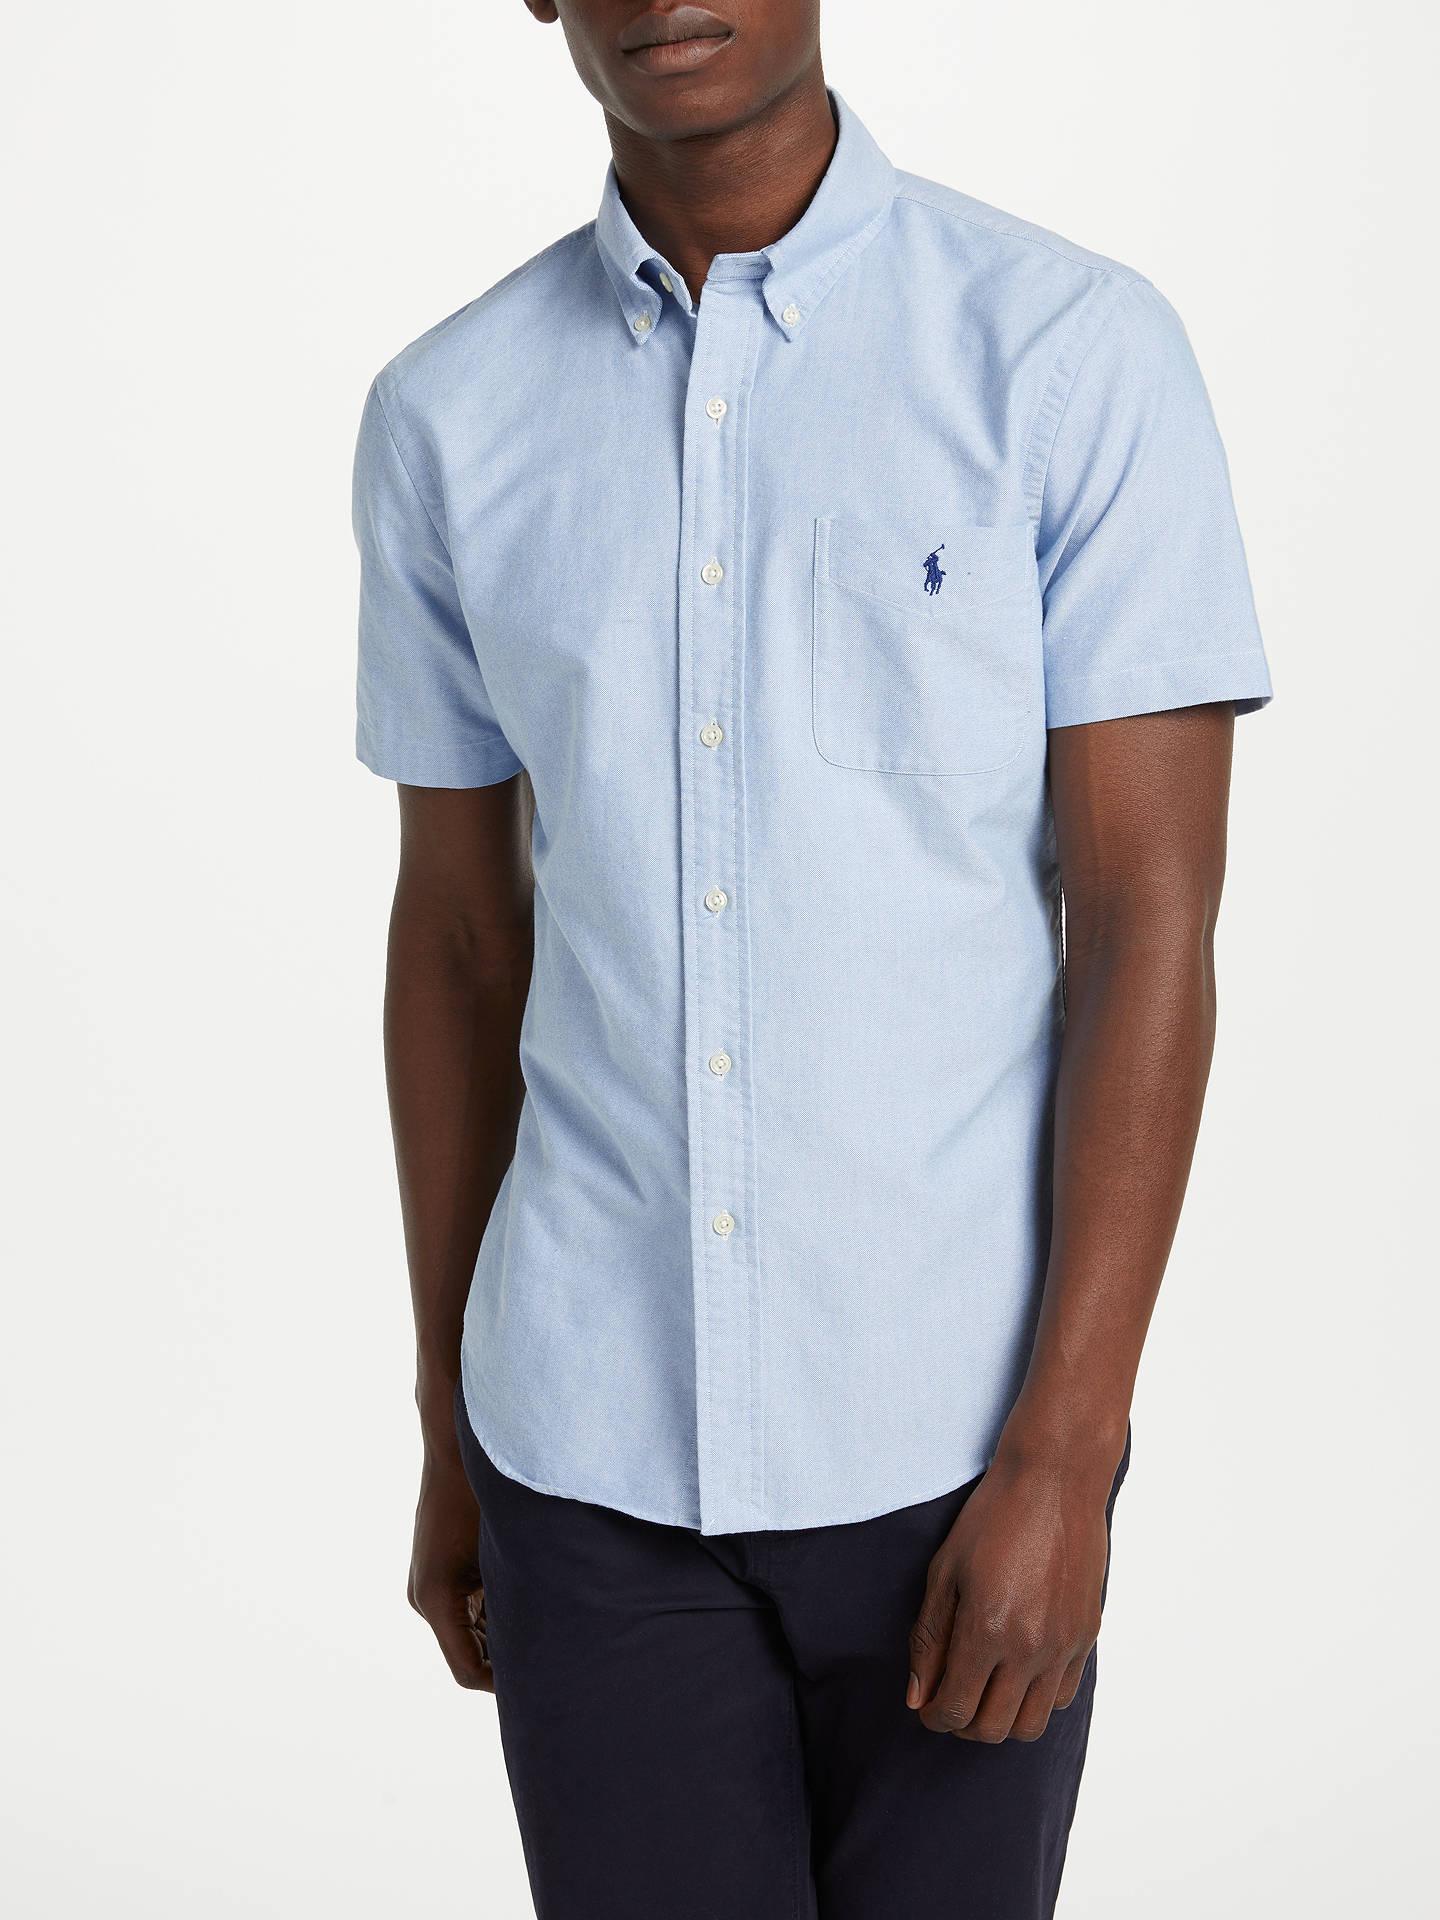 Polo Ralph Lauren Short Sleeve Slim Oxford Shirt at John ...